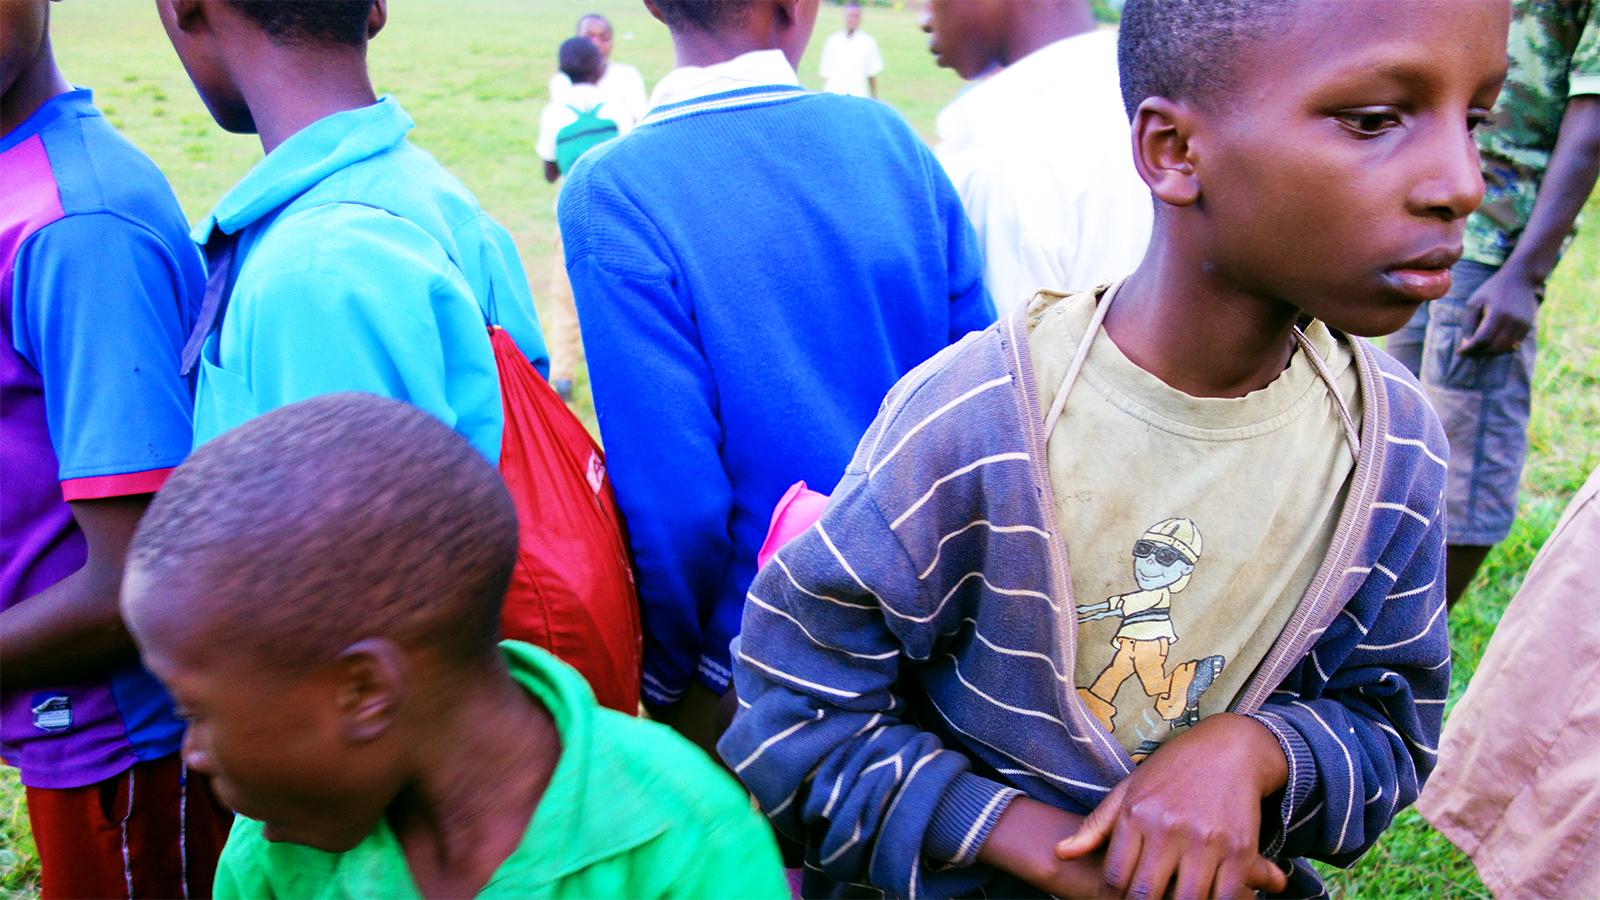 GACollaborative_MLSC_Children-01_1600.jpg